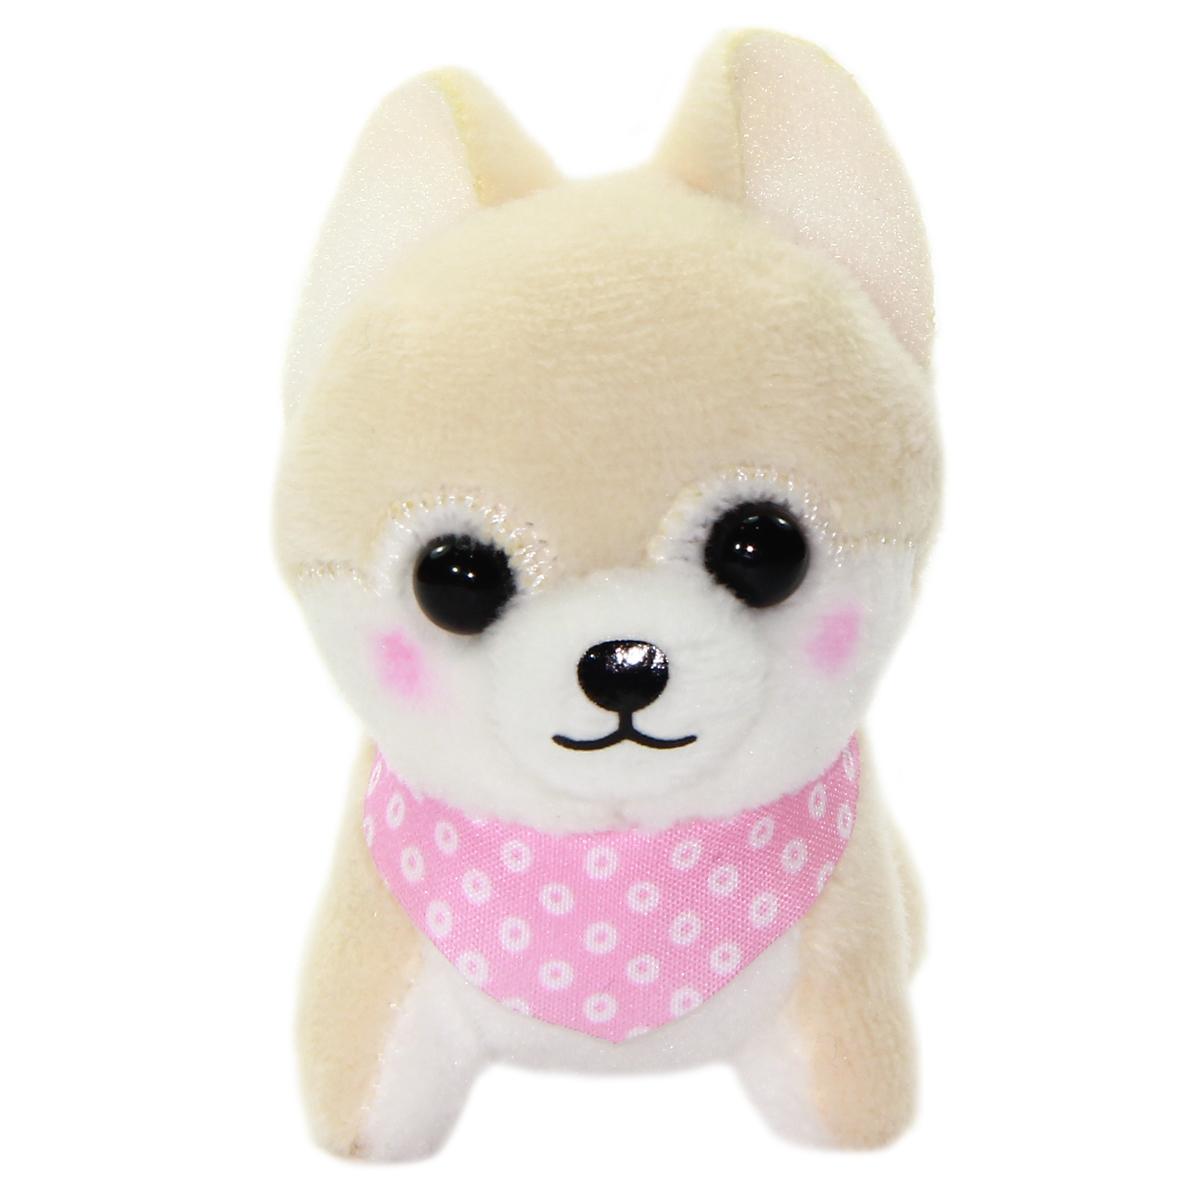 Amuse Dog Plushie, Mameshiba San Kyodai Sasuke Beige Small Plushie Strap 3 Inches